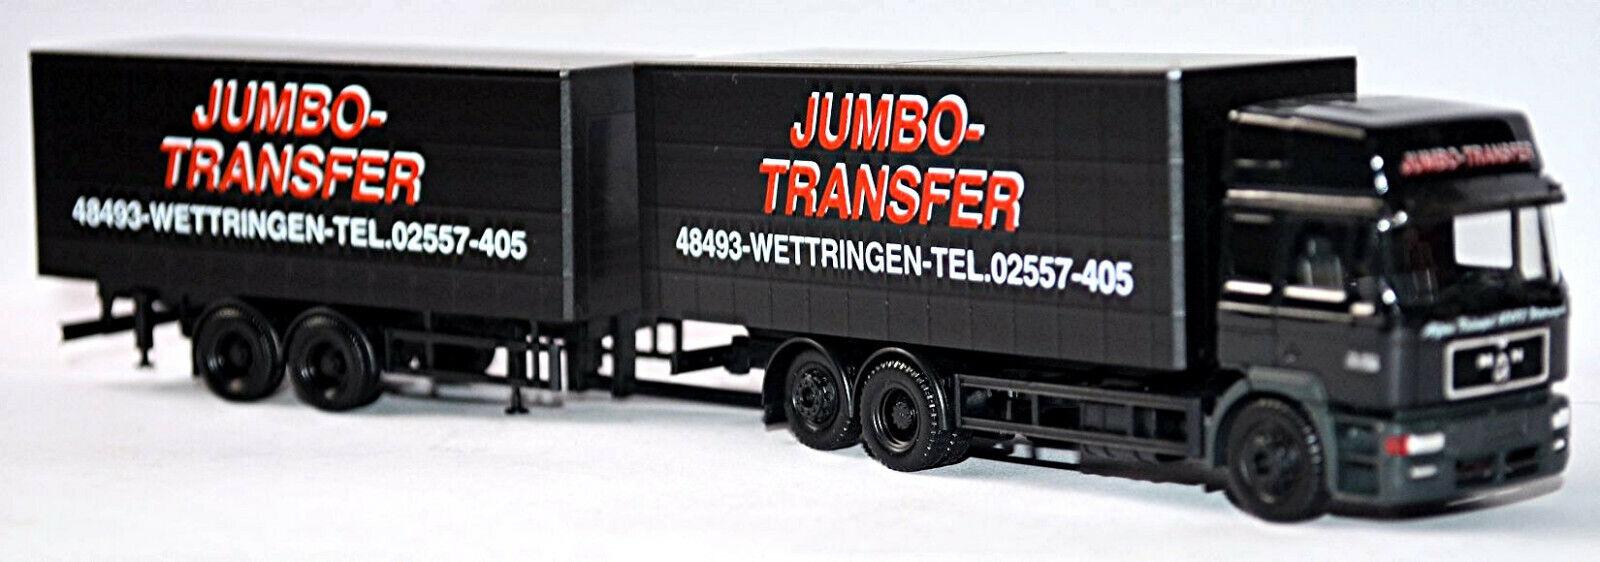 Man F 2000 Evo HD T FRAR555533;65533; ndem Hz Jumbo -Transfer Wettingen Herpa